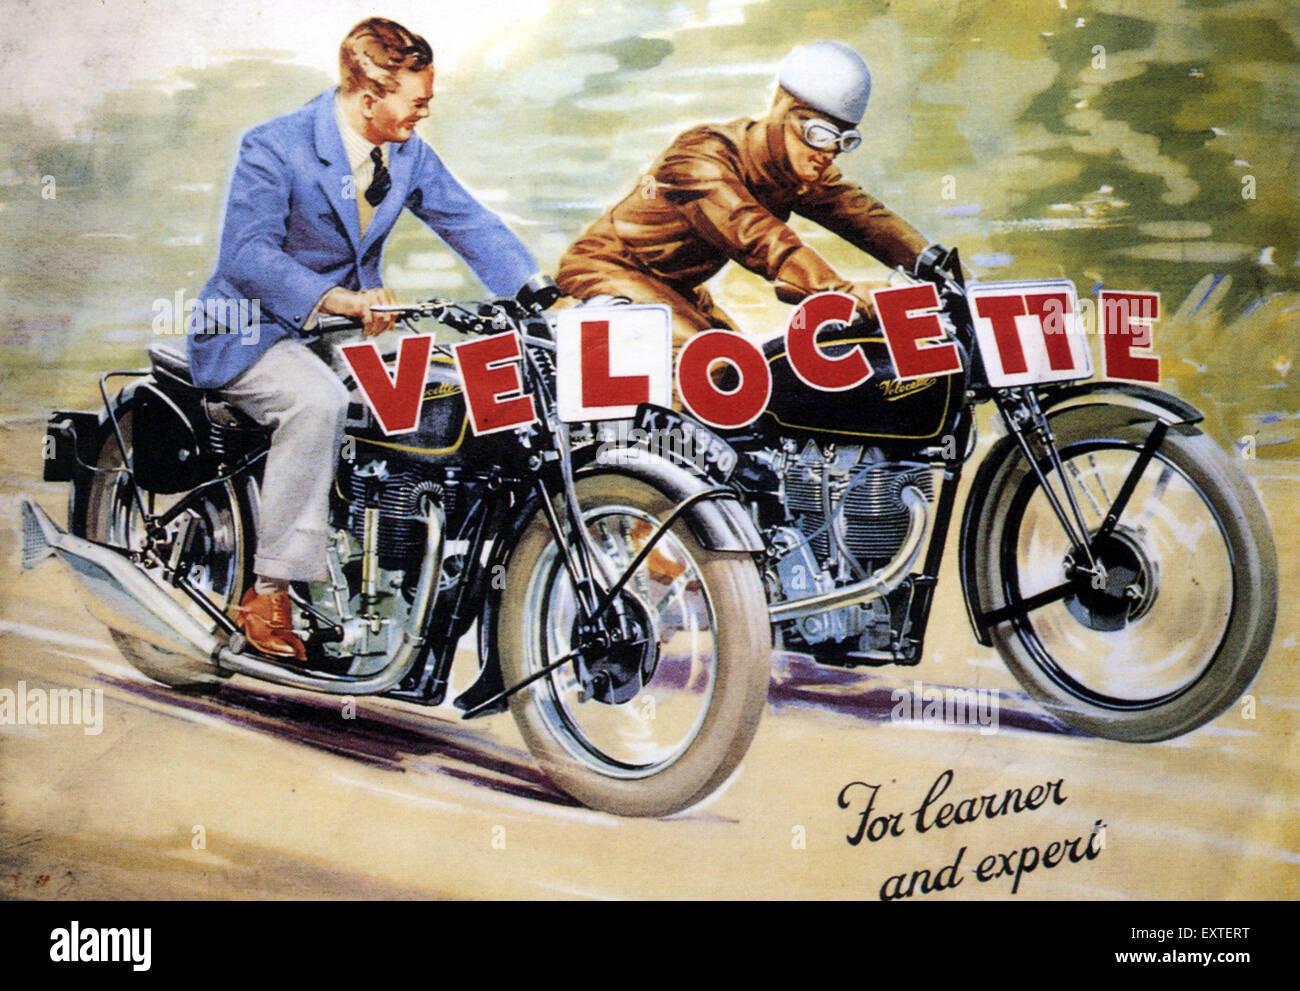 UK Velocette Magazine Advert - Stock Image